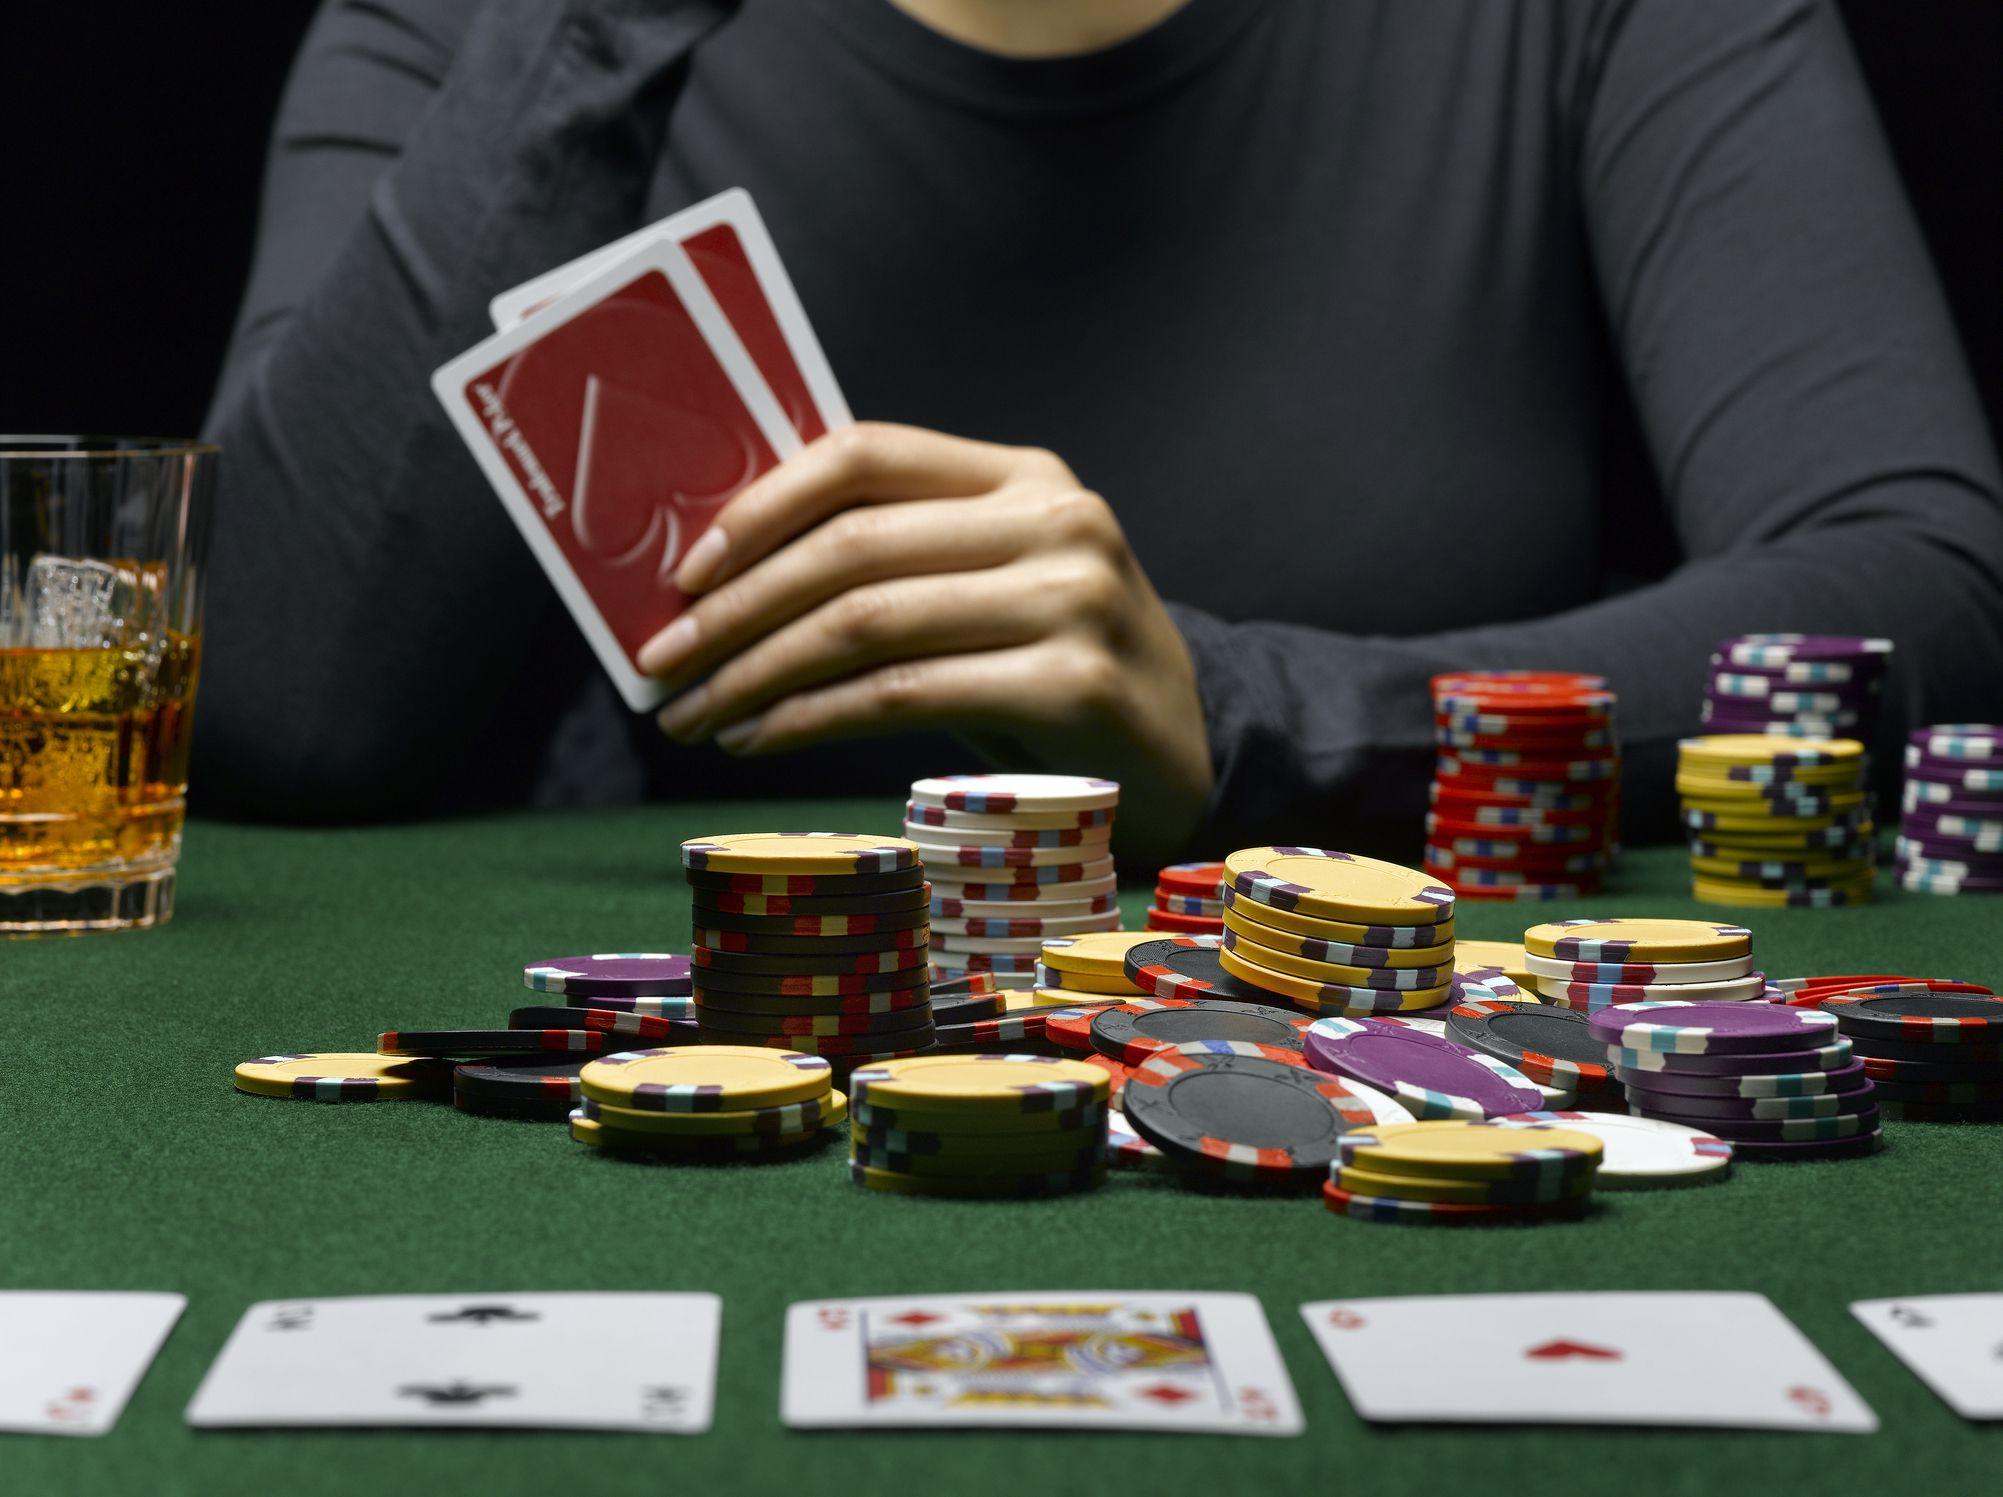 Favorable Poker Online Opportunities For Willing Bettors